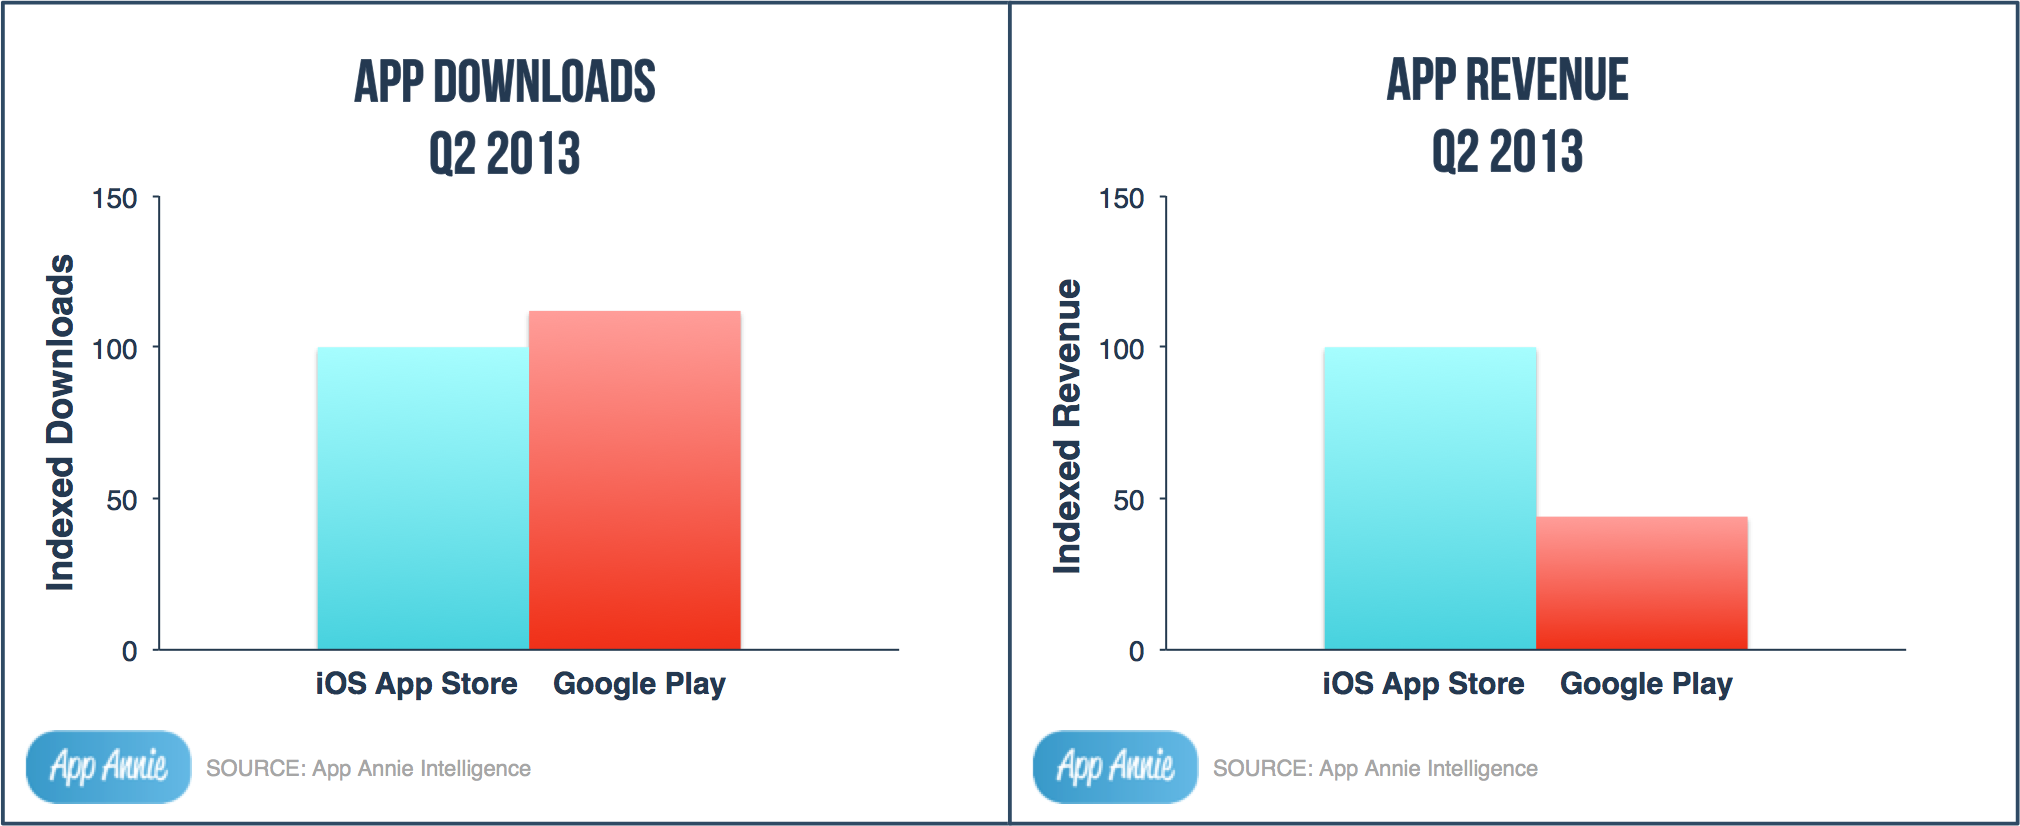 Google Play Downloads Surpass App Store Downloads by 10%